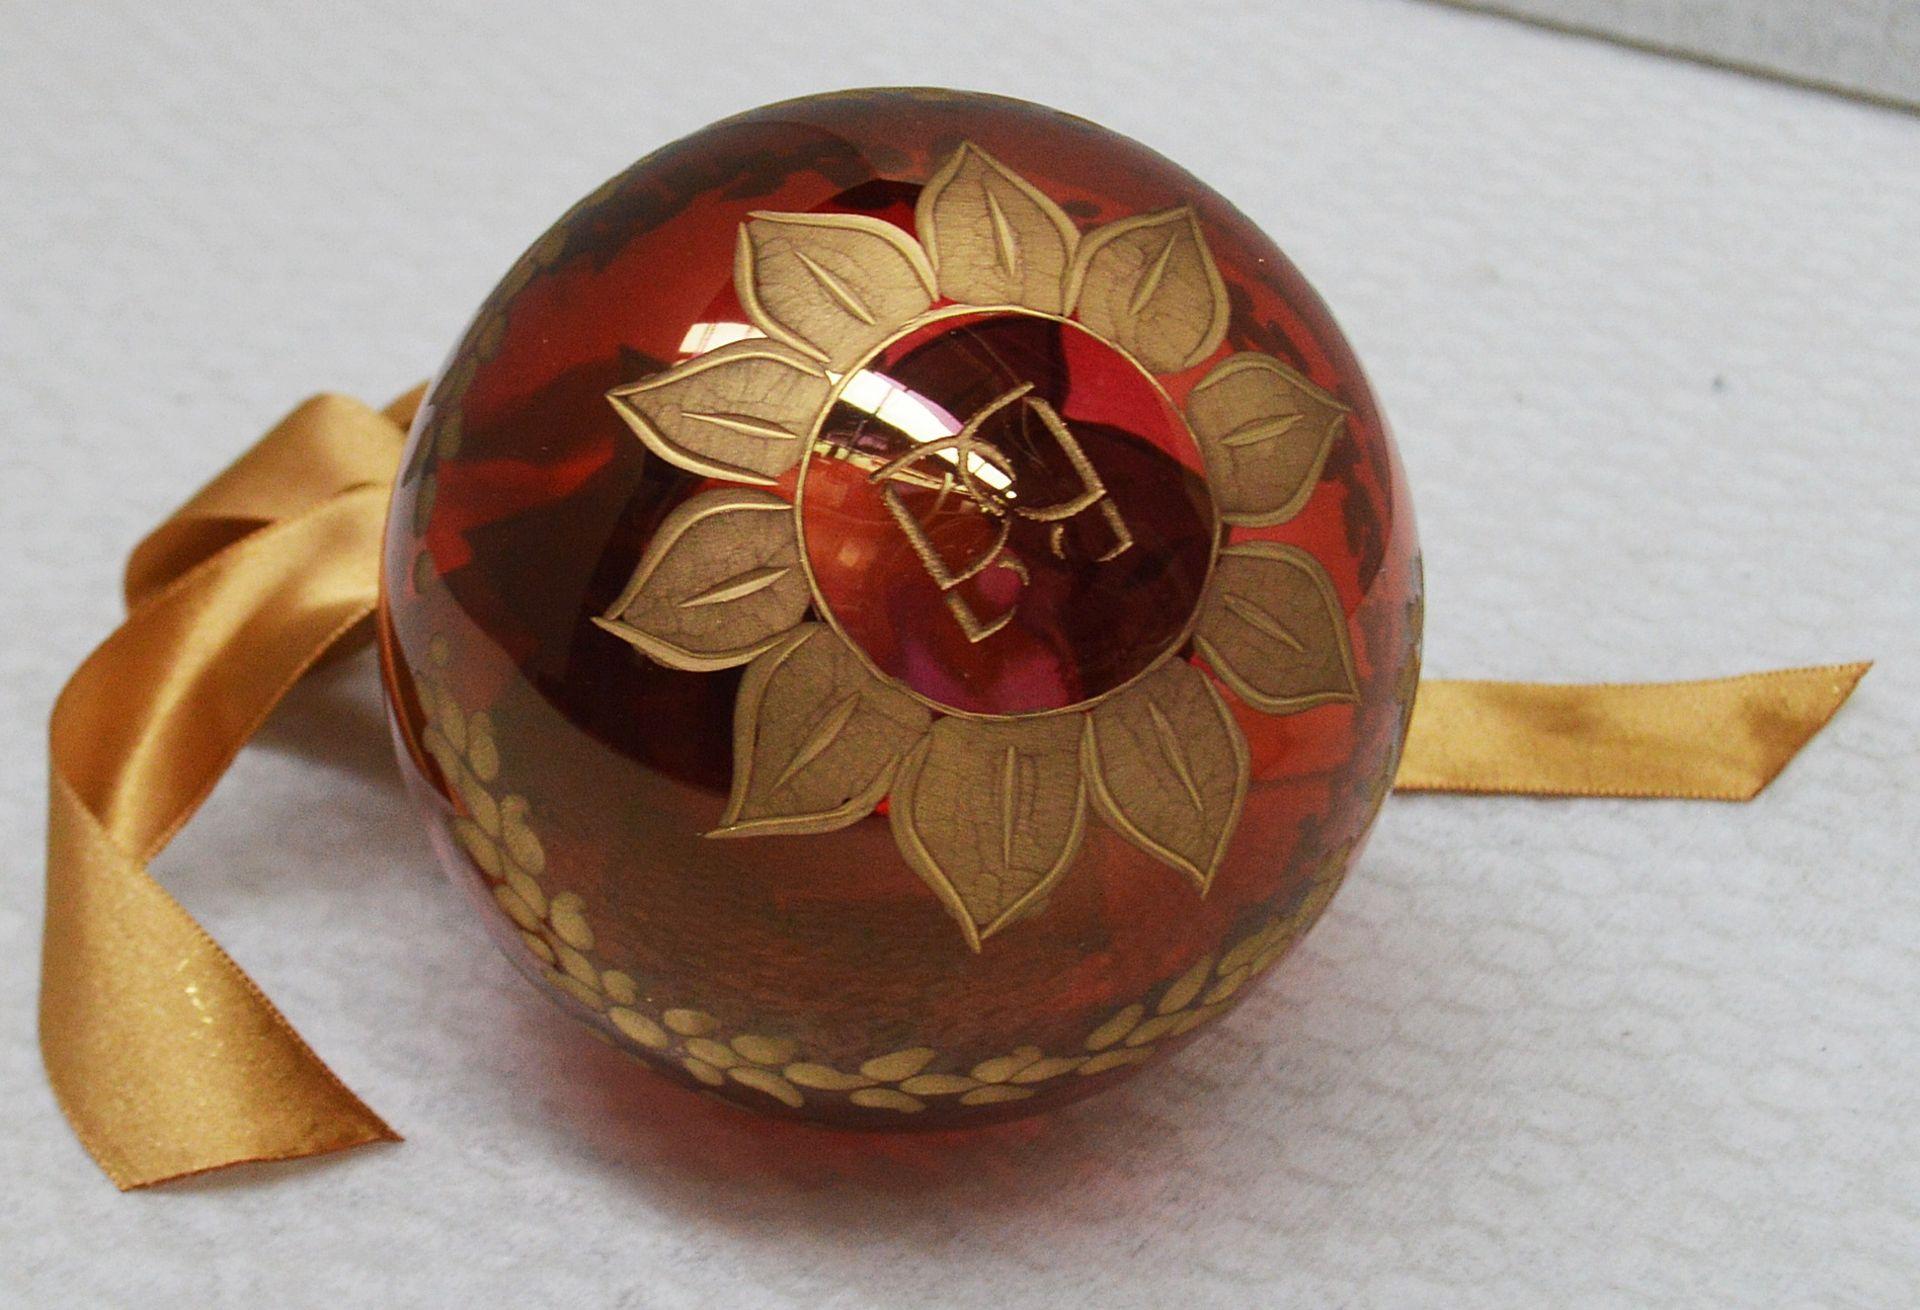 1 x BALDI 'Home Jewels' Italian Hand-crafted Artisan Christmas Tree Decoration - RRP £114.00 - Image 5 of 5